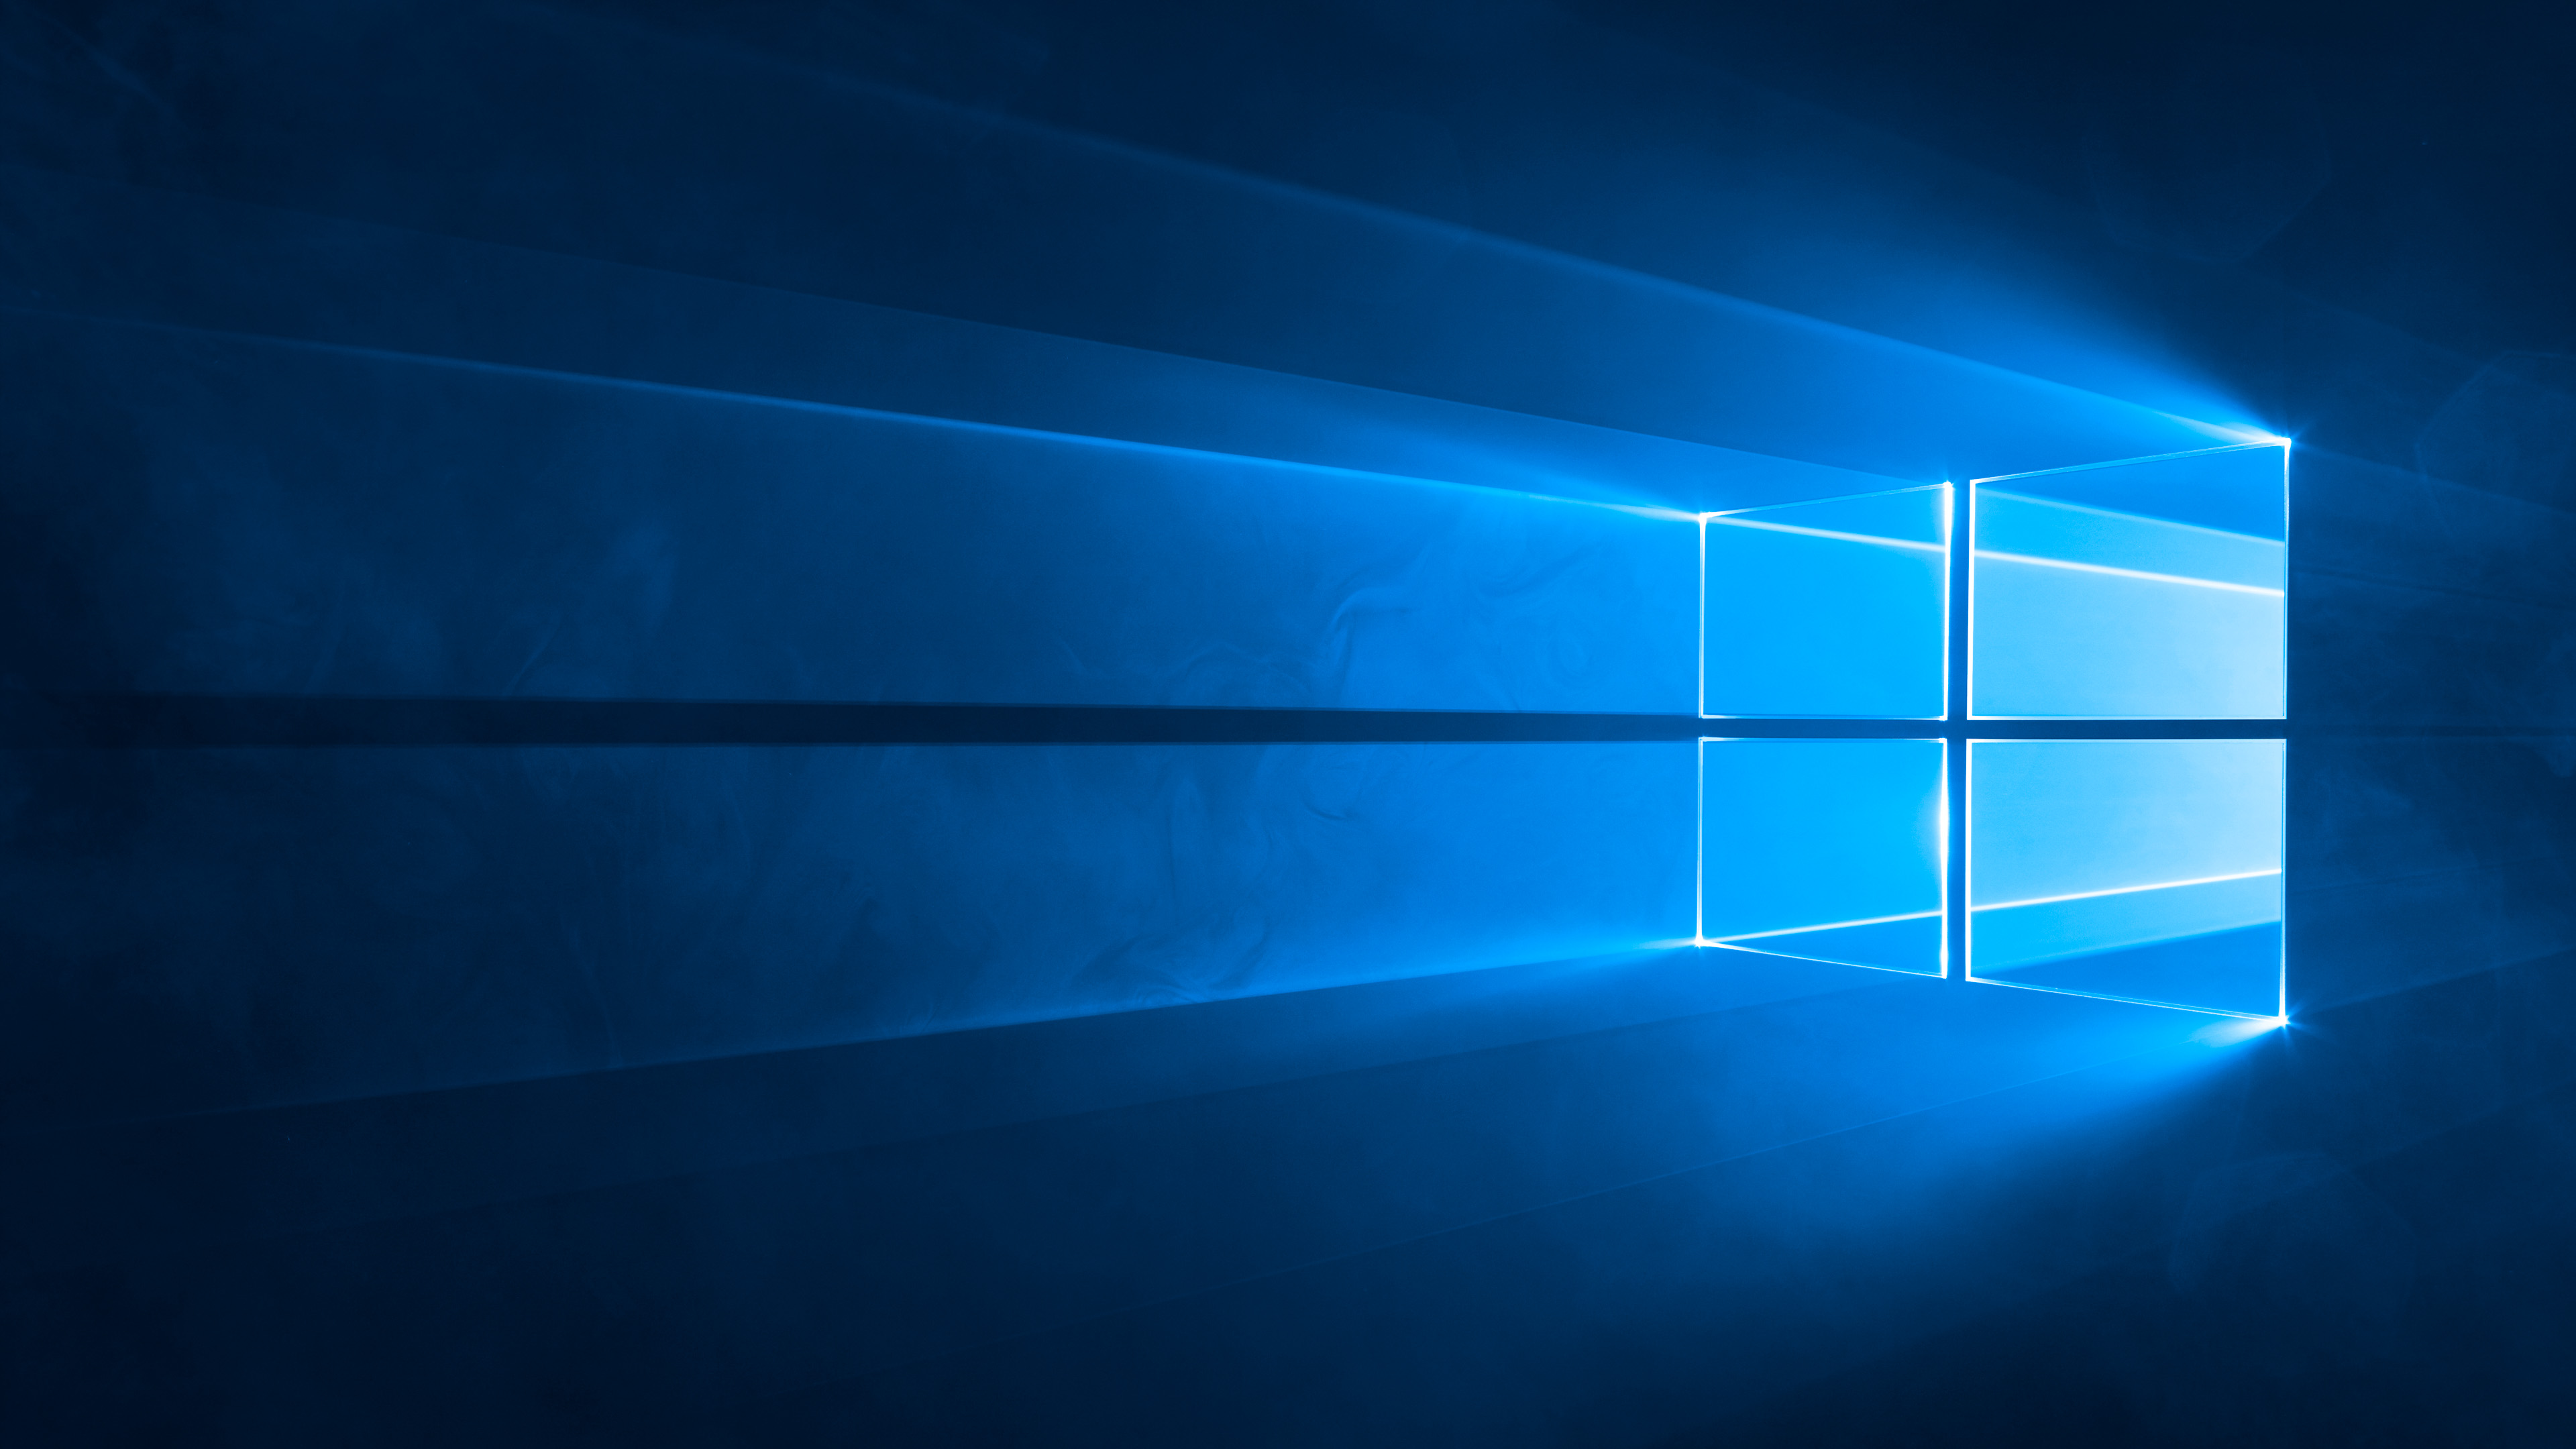 Windows 10 4K Wallpapers   Ultra HD Top 15 AxeeTech 3840x2160